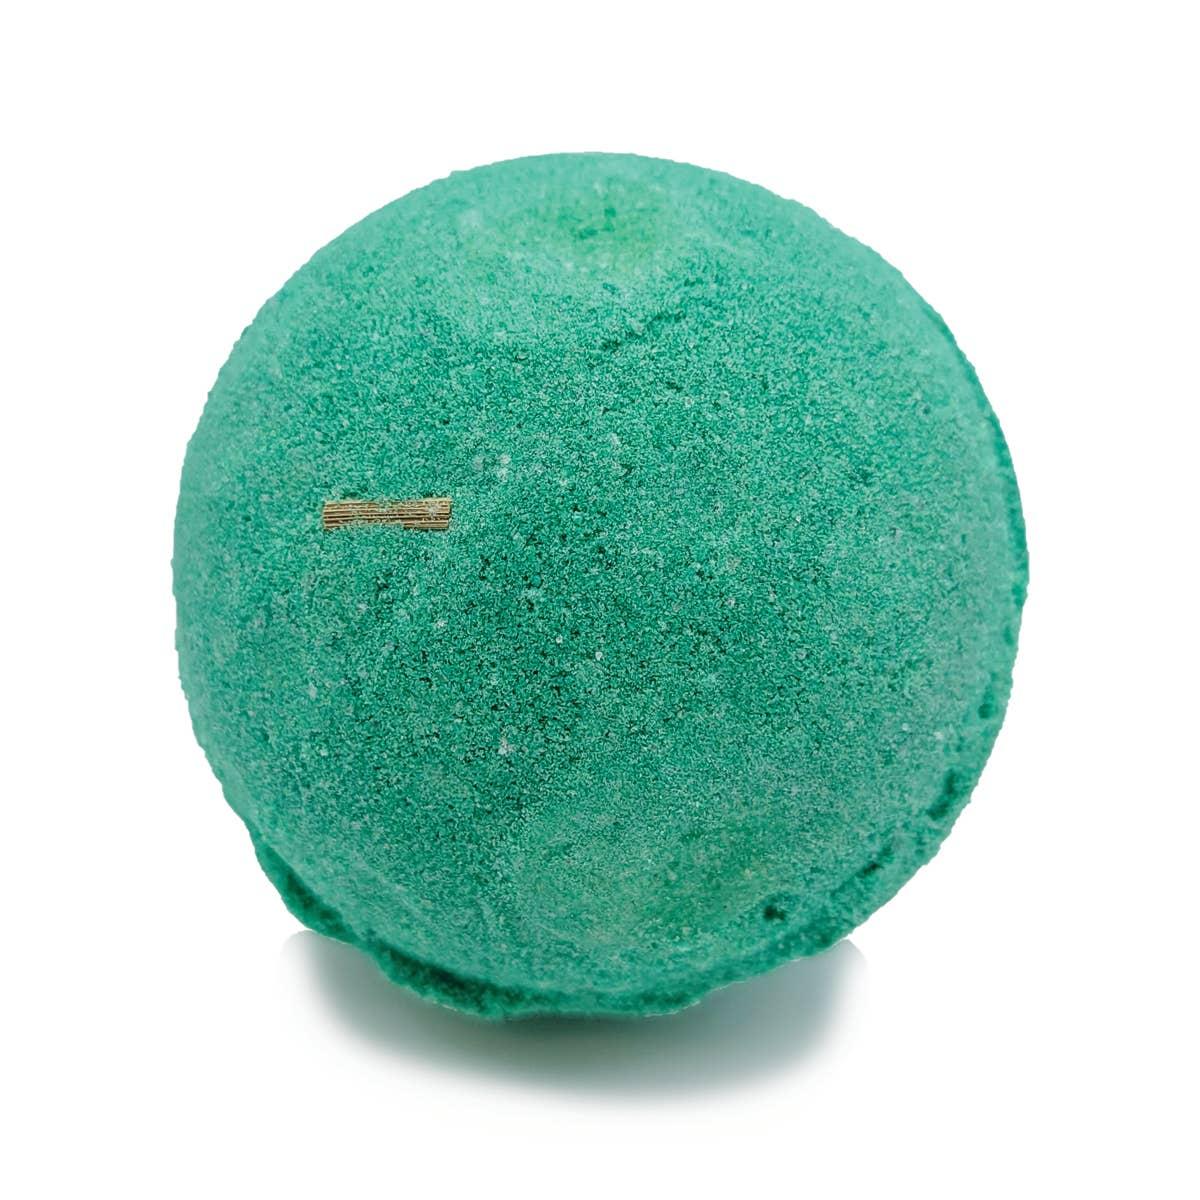 Evolve - Bath Bomb - Meadow (Seasonal - Spring) | Trada Marketplace